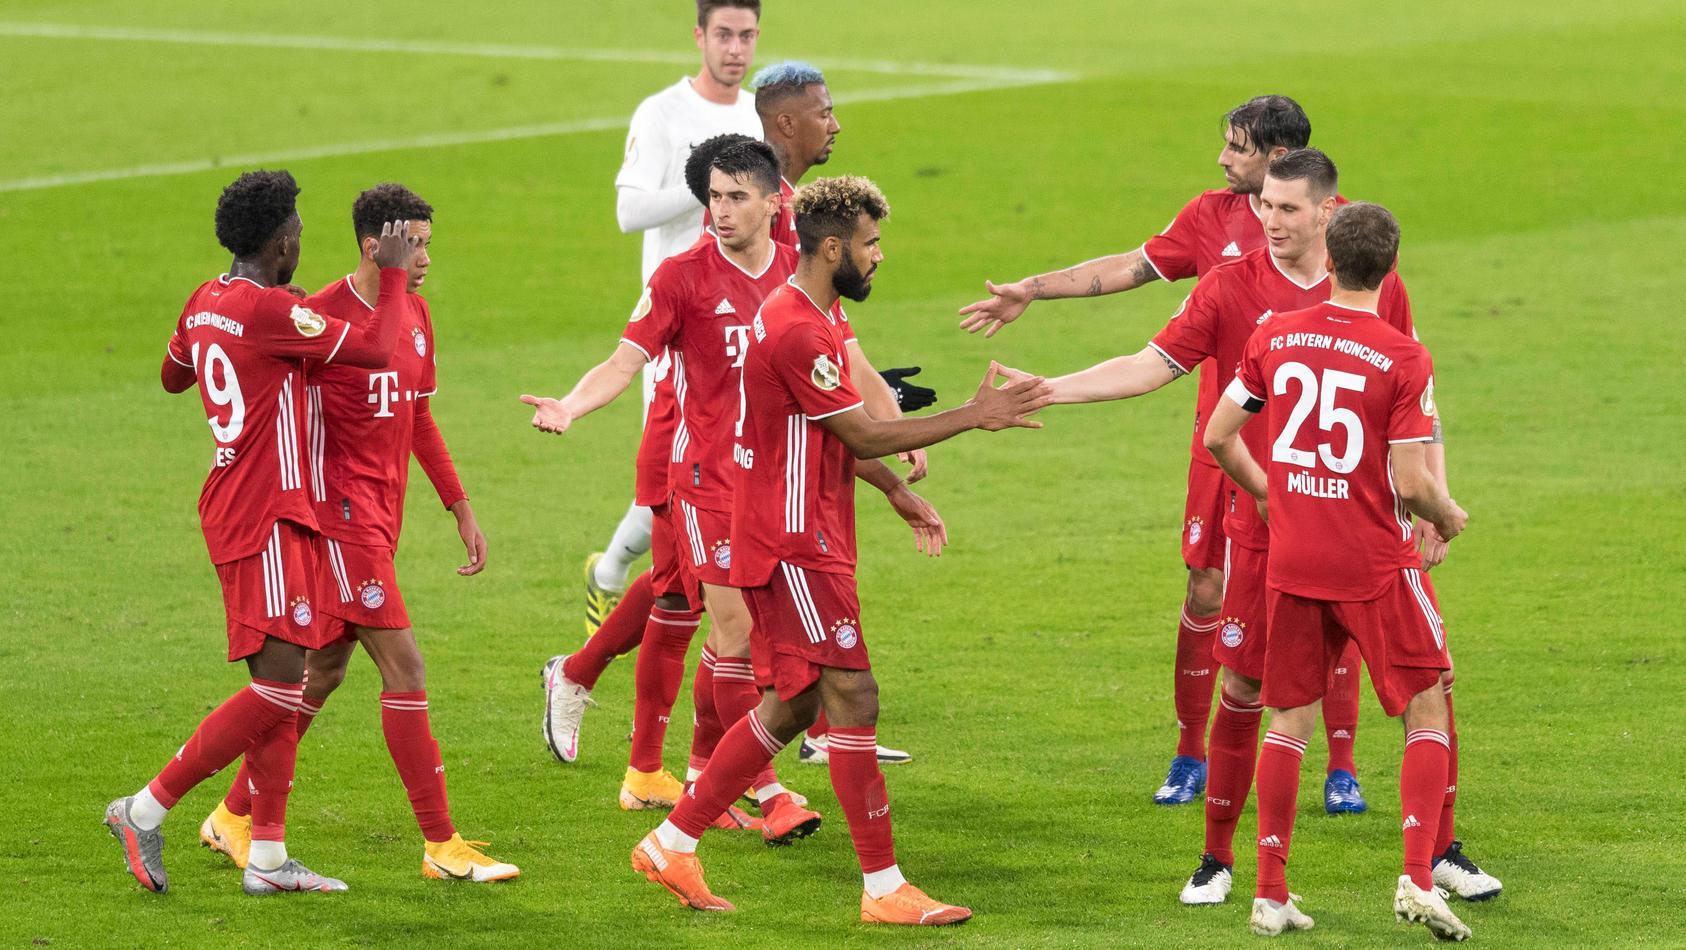 Fußball, DFB-Pokal, 1. FC Düren - FC Bayern München Im Bild Bayern Torjubel bejubelt Tor 2:0. München Allianz Arena Bay